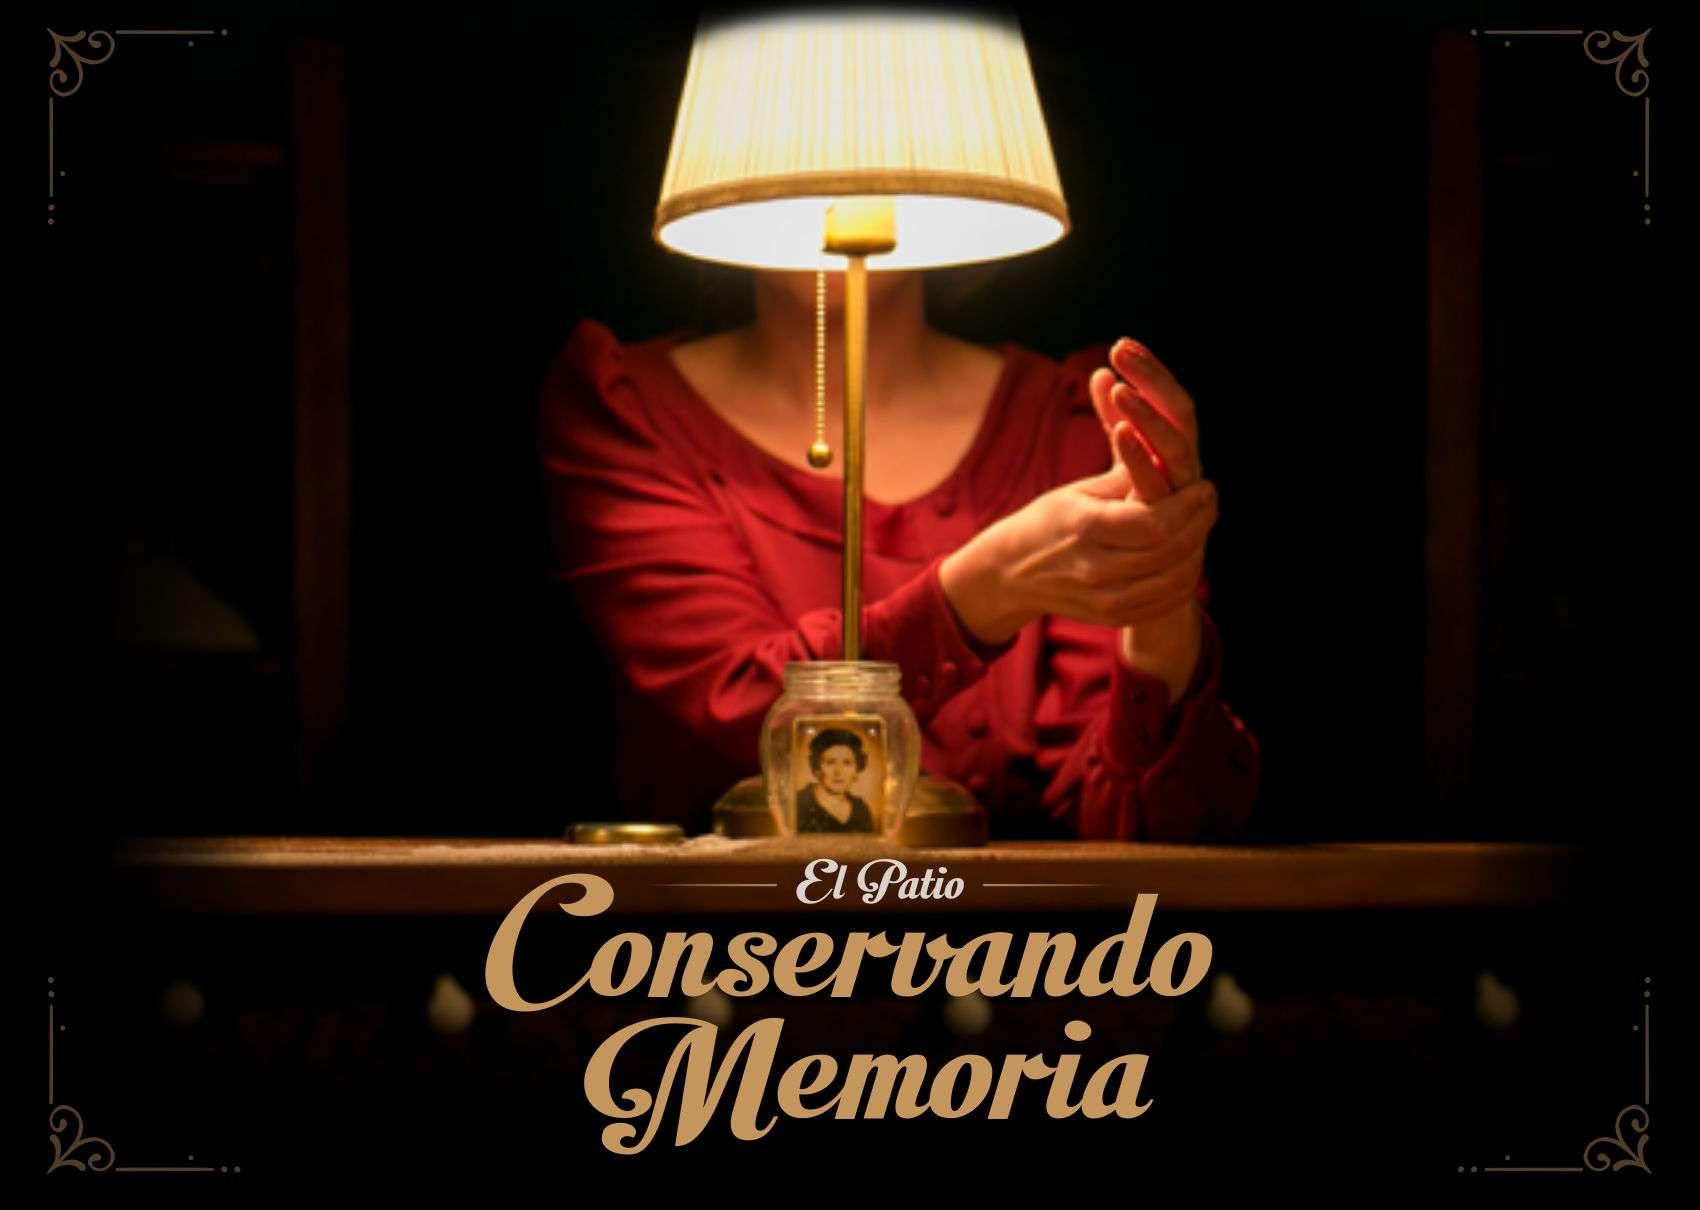 CONSERVANDO MEMORIA